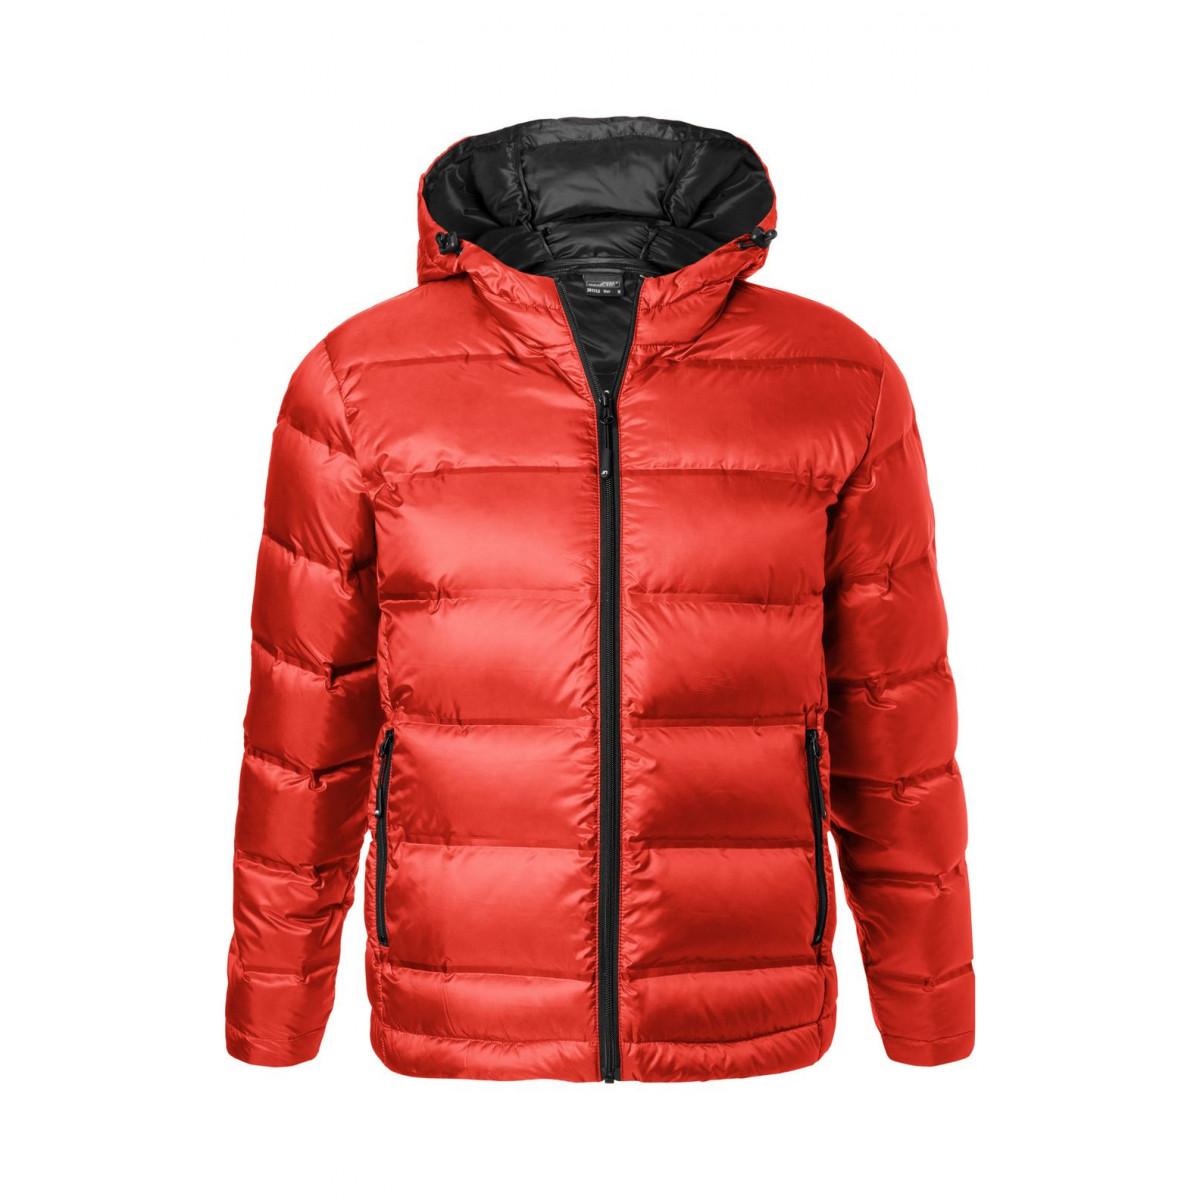 Куртка мужская JN1152 Mens Hooded Down Jacket - Ярко-красный/Черный